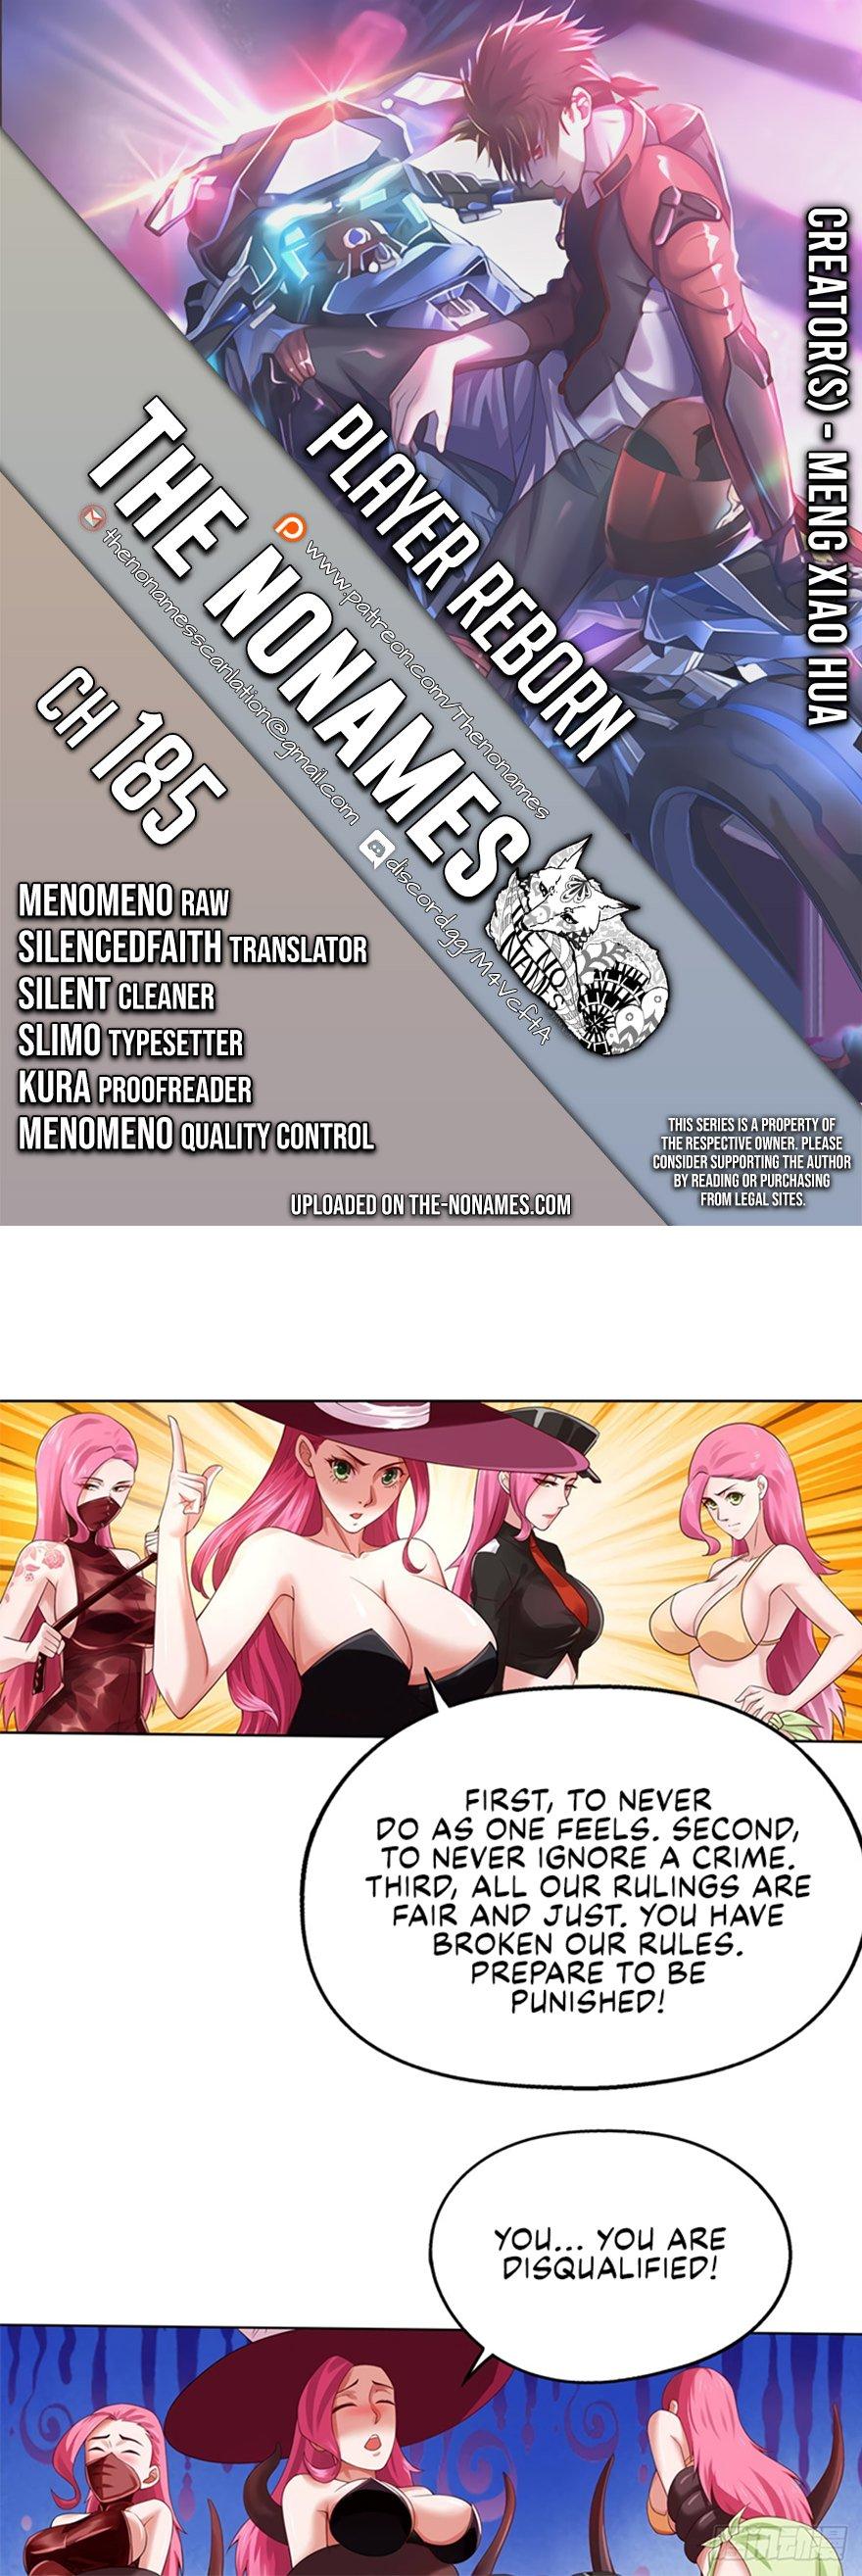 https://img2.nineanime.com/comics/pic4/54/28214/2193557/5dfa66d02d80ad9daebcc772570ae369.jpg Page 1